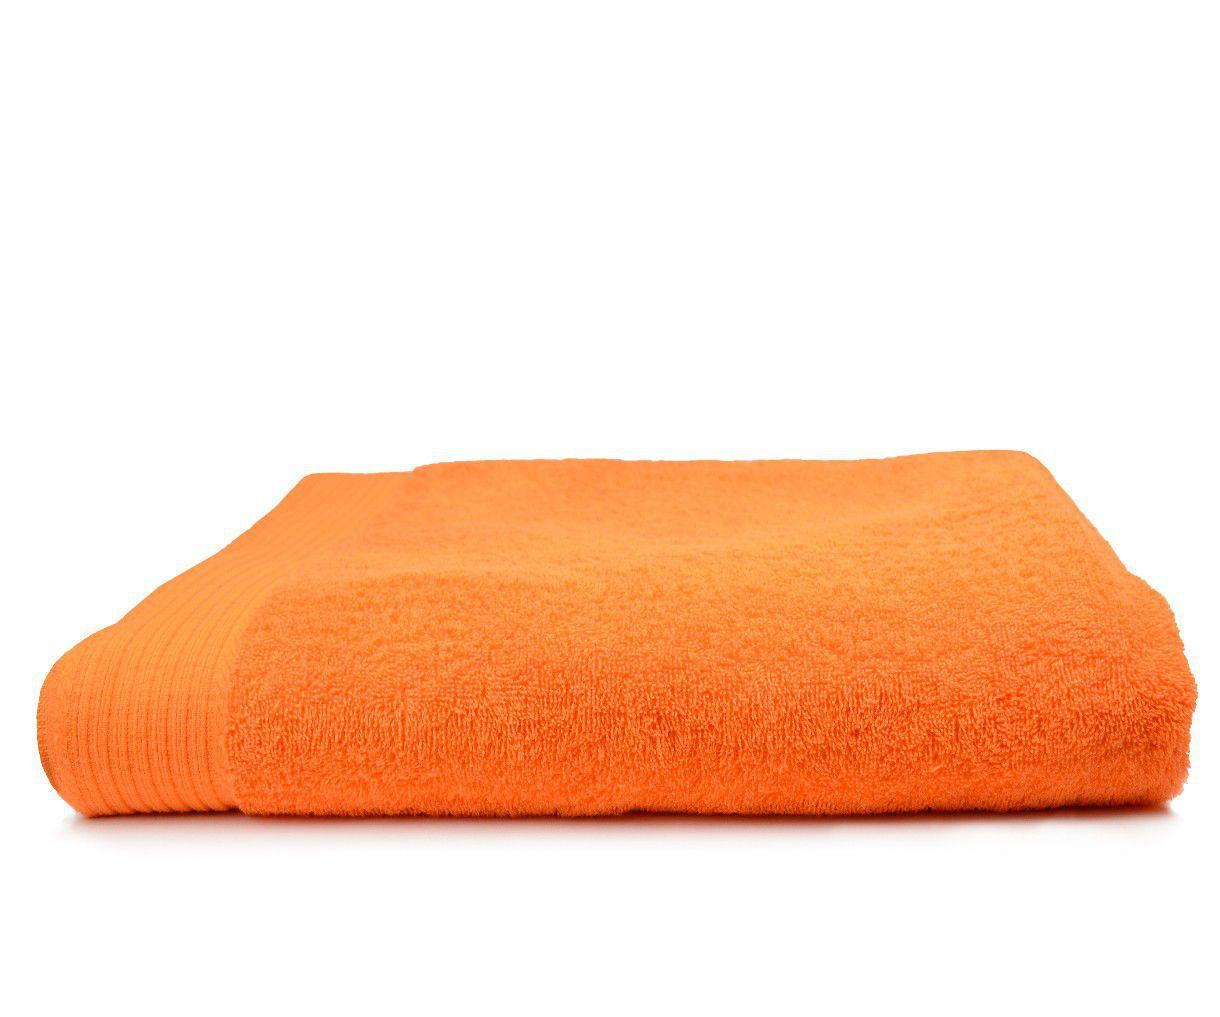 The One Badlaken 450 gram 100x180 cm Oranje